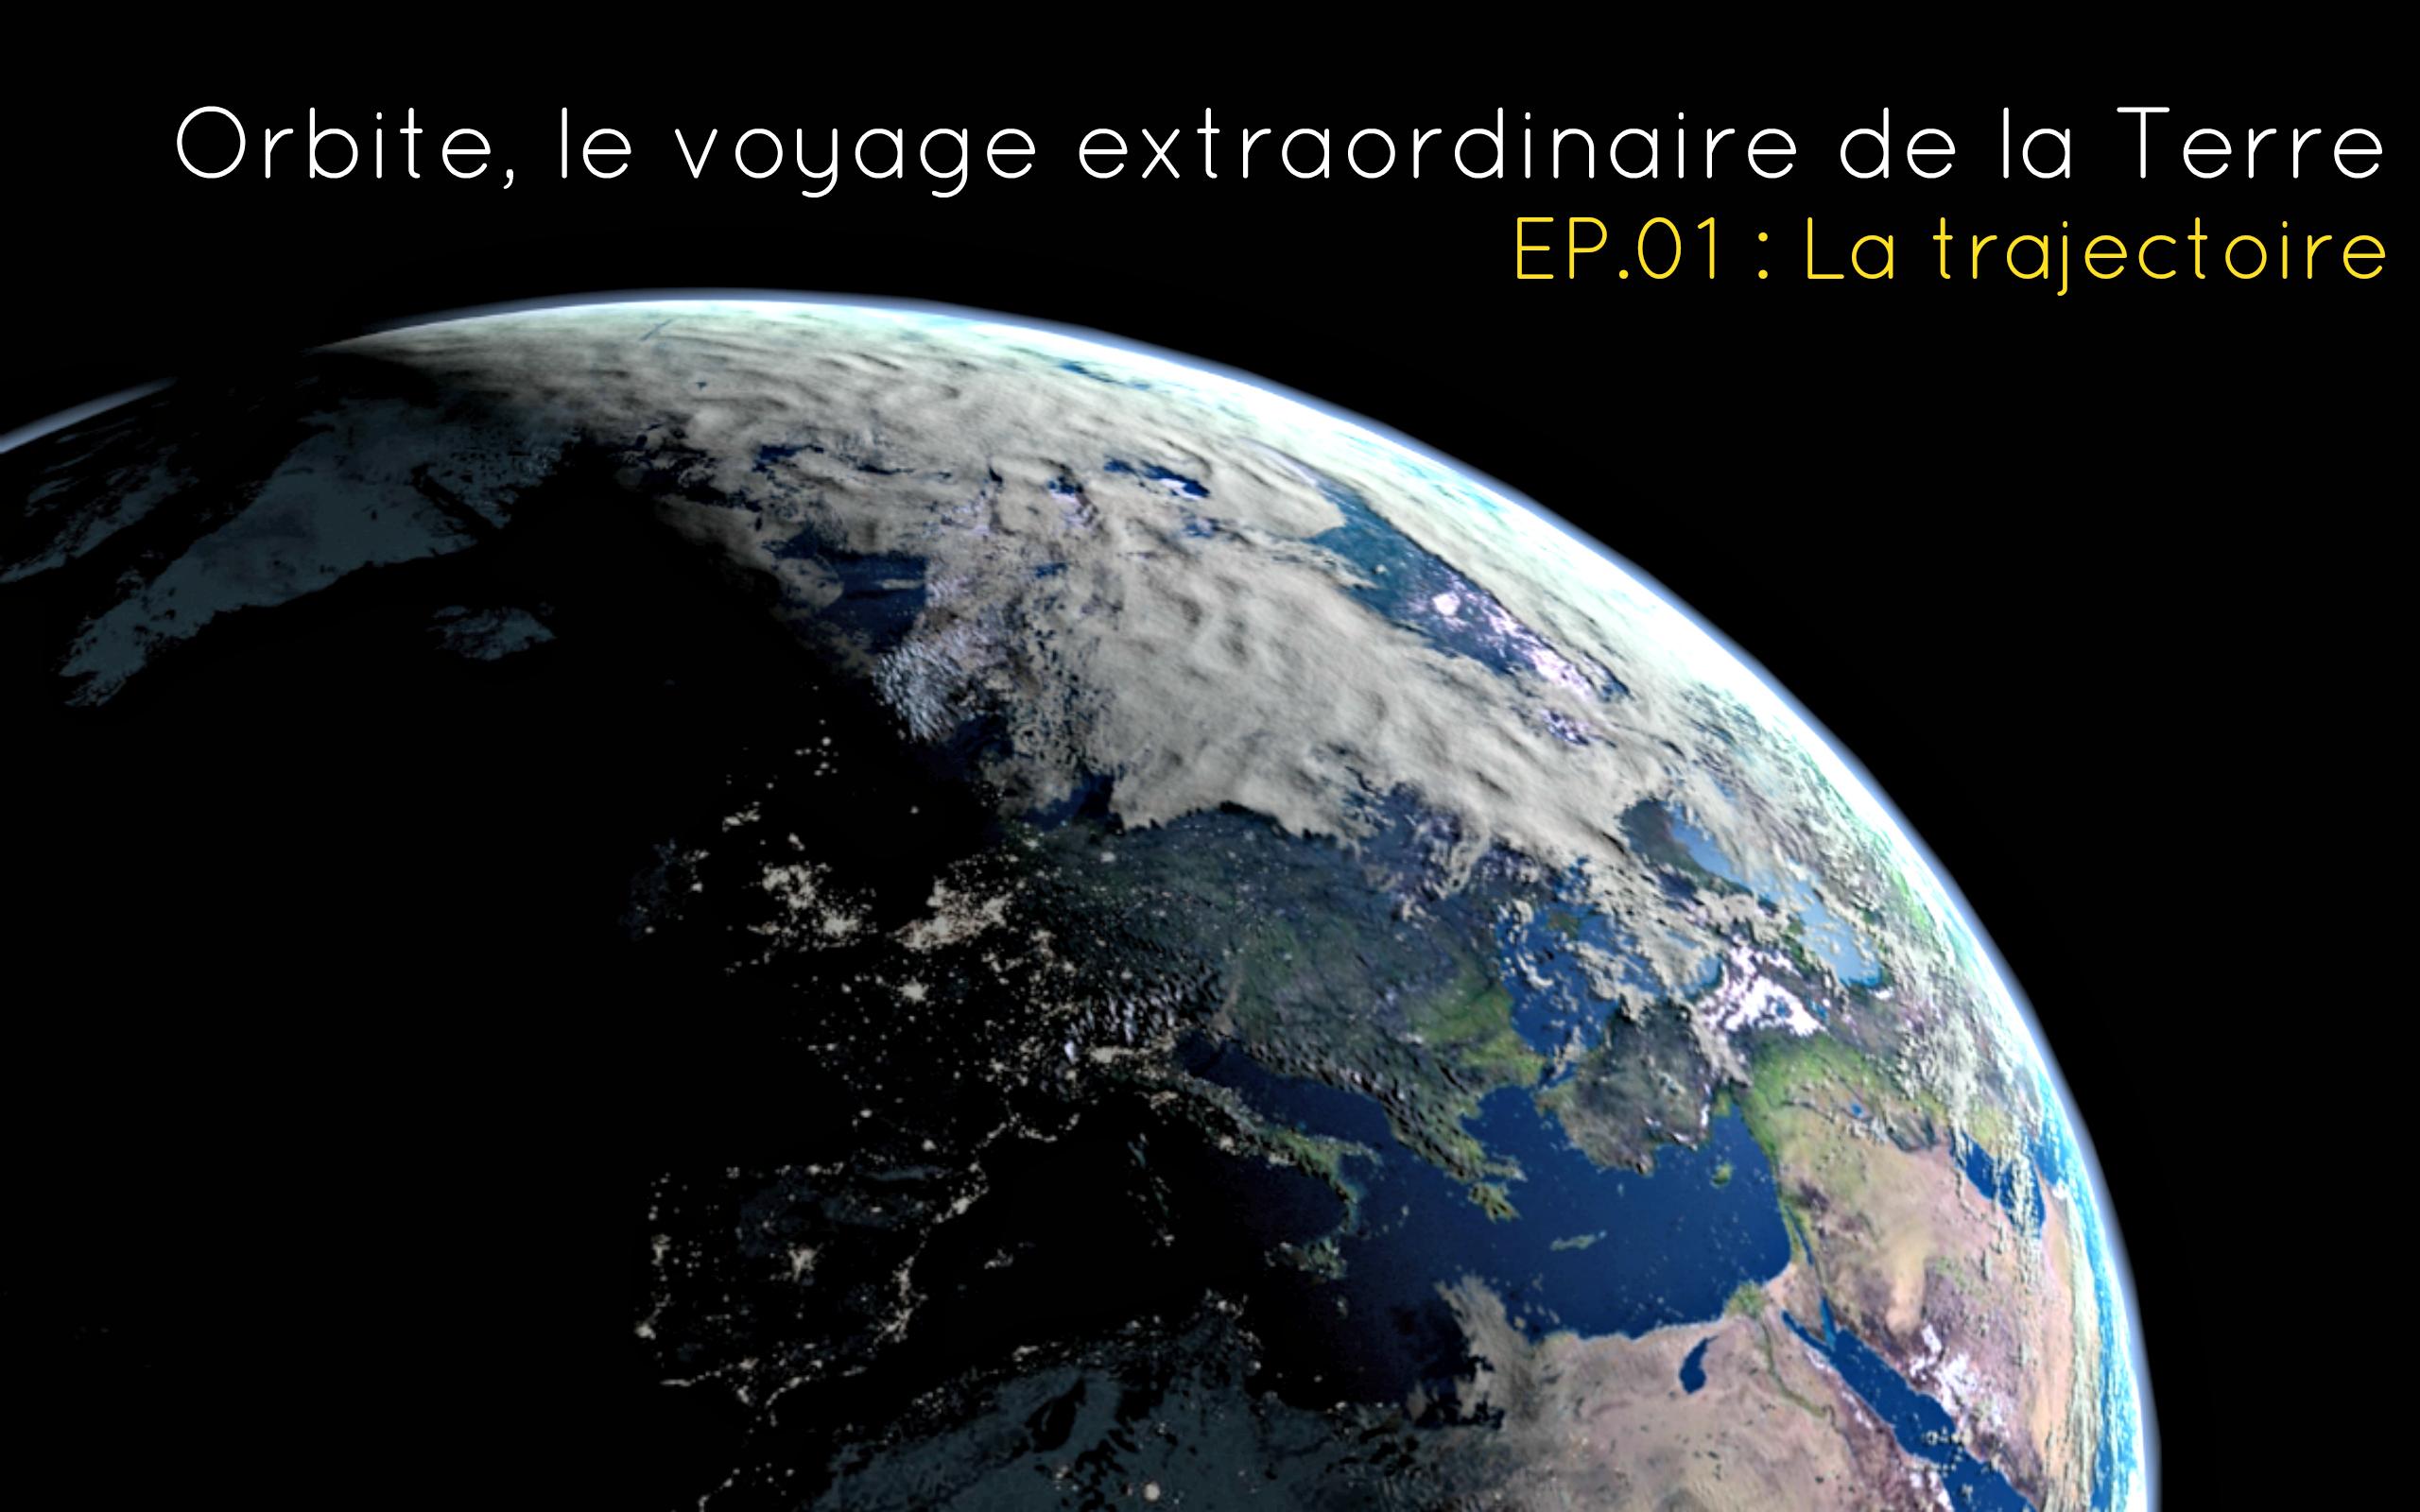 Documentaire Orbite, le voyage extraordinaire de la Terre – 1 – La trajectoire